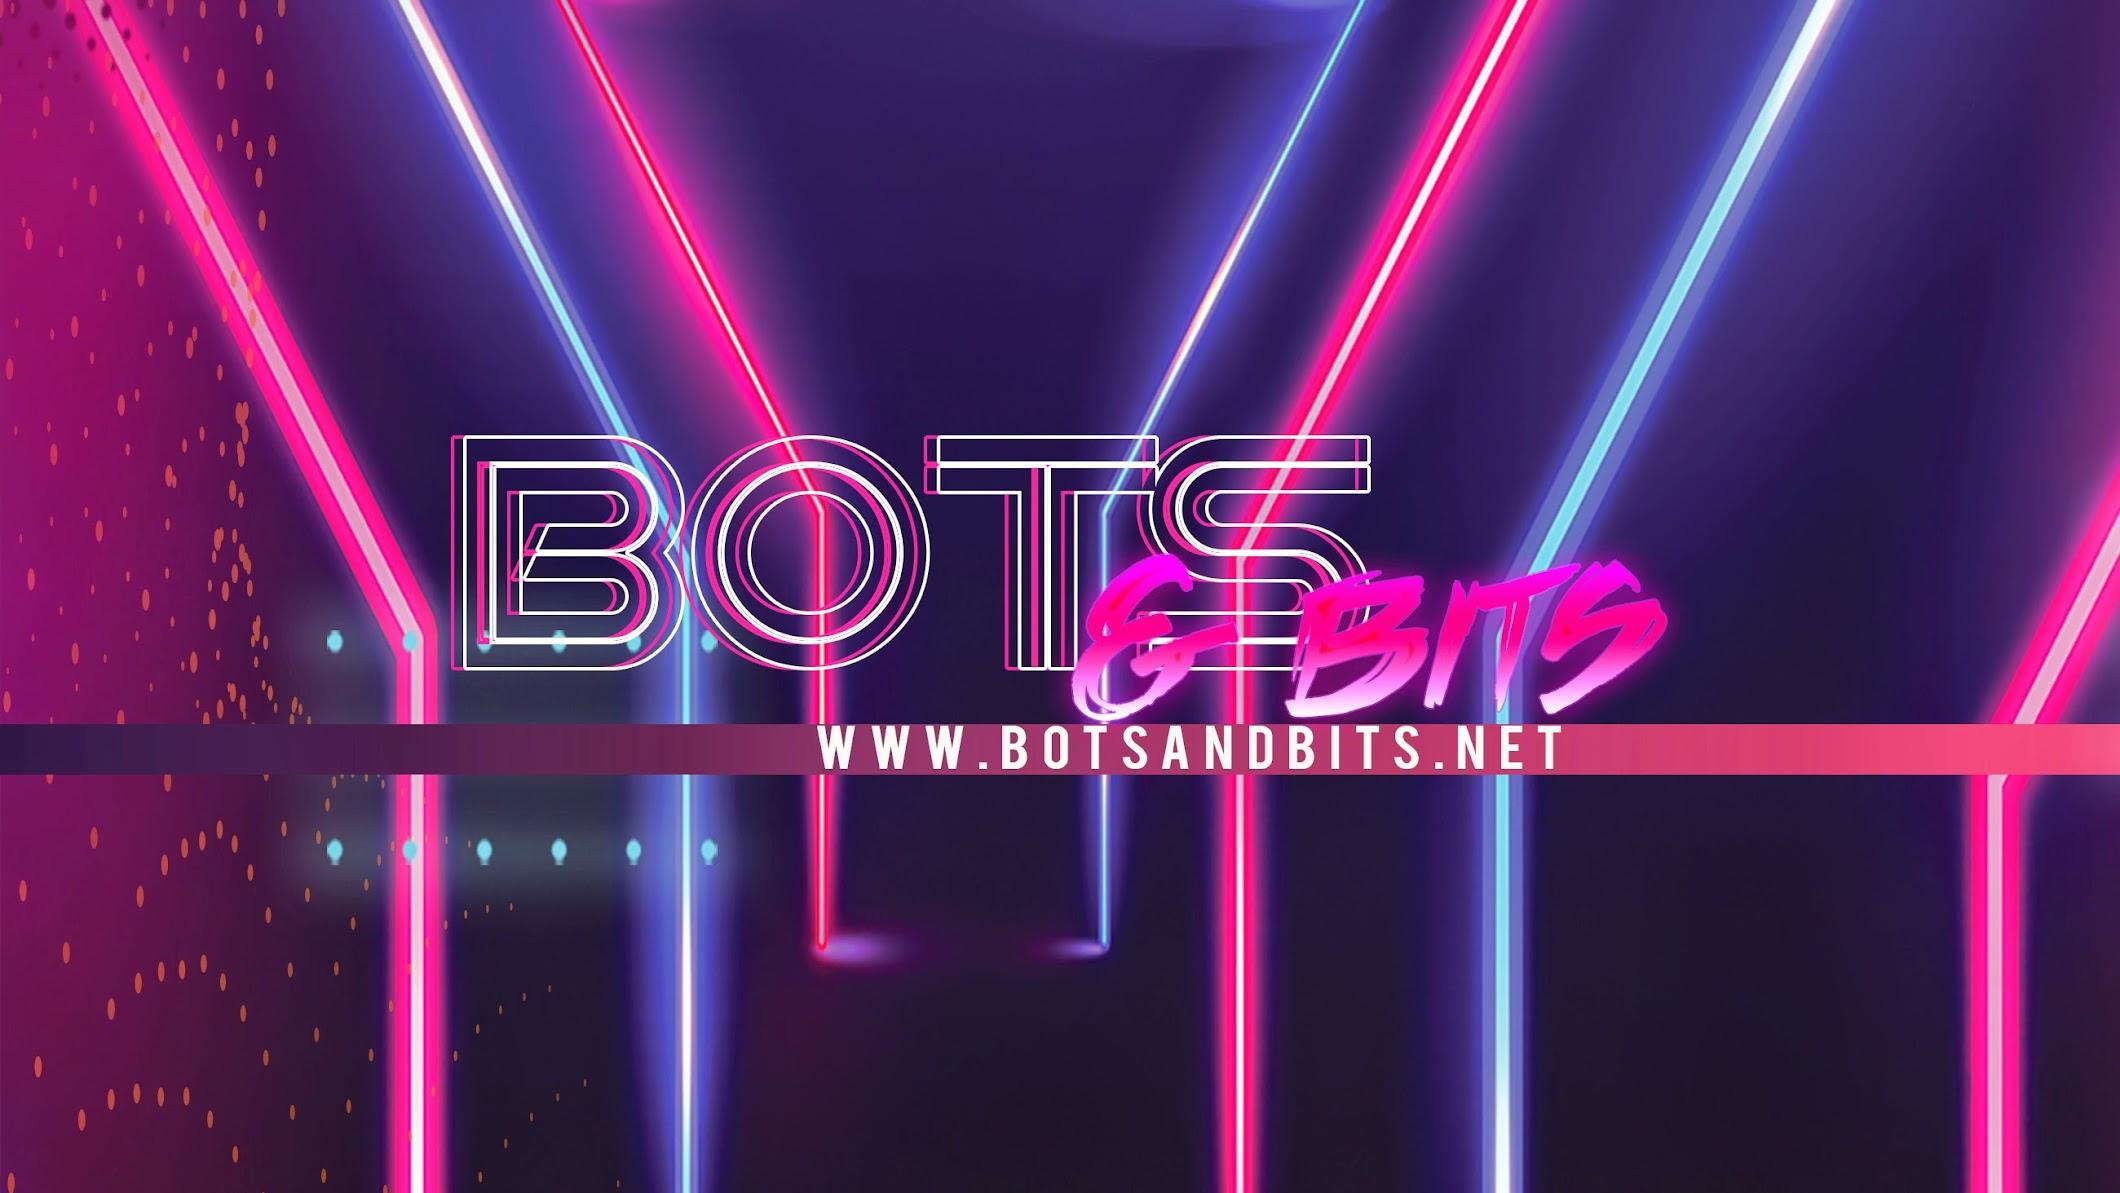 Bots and Bits